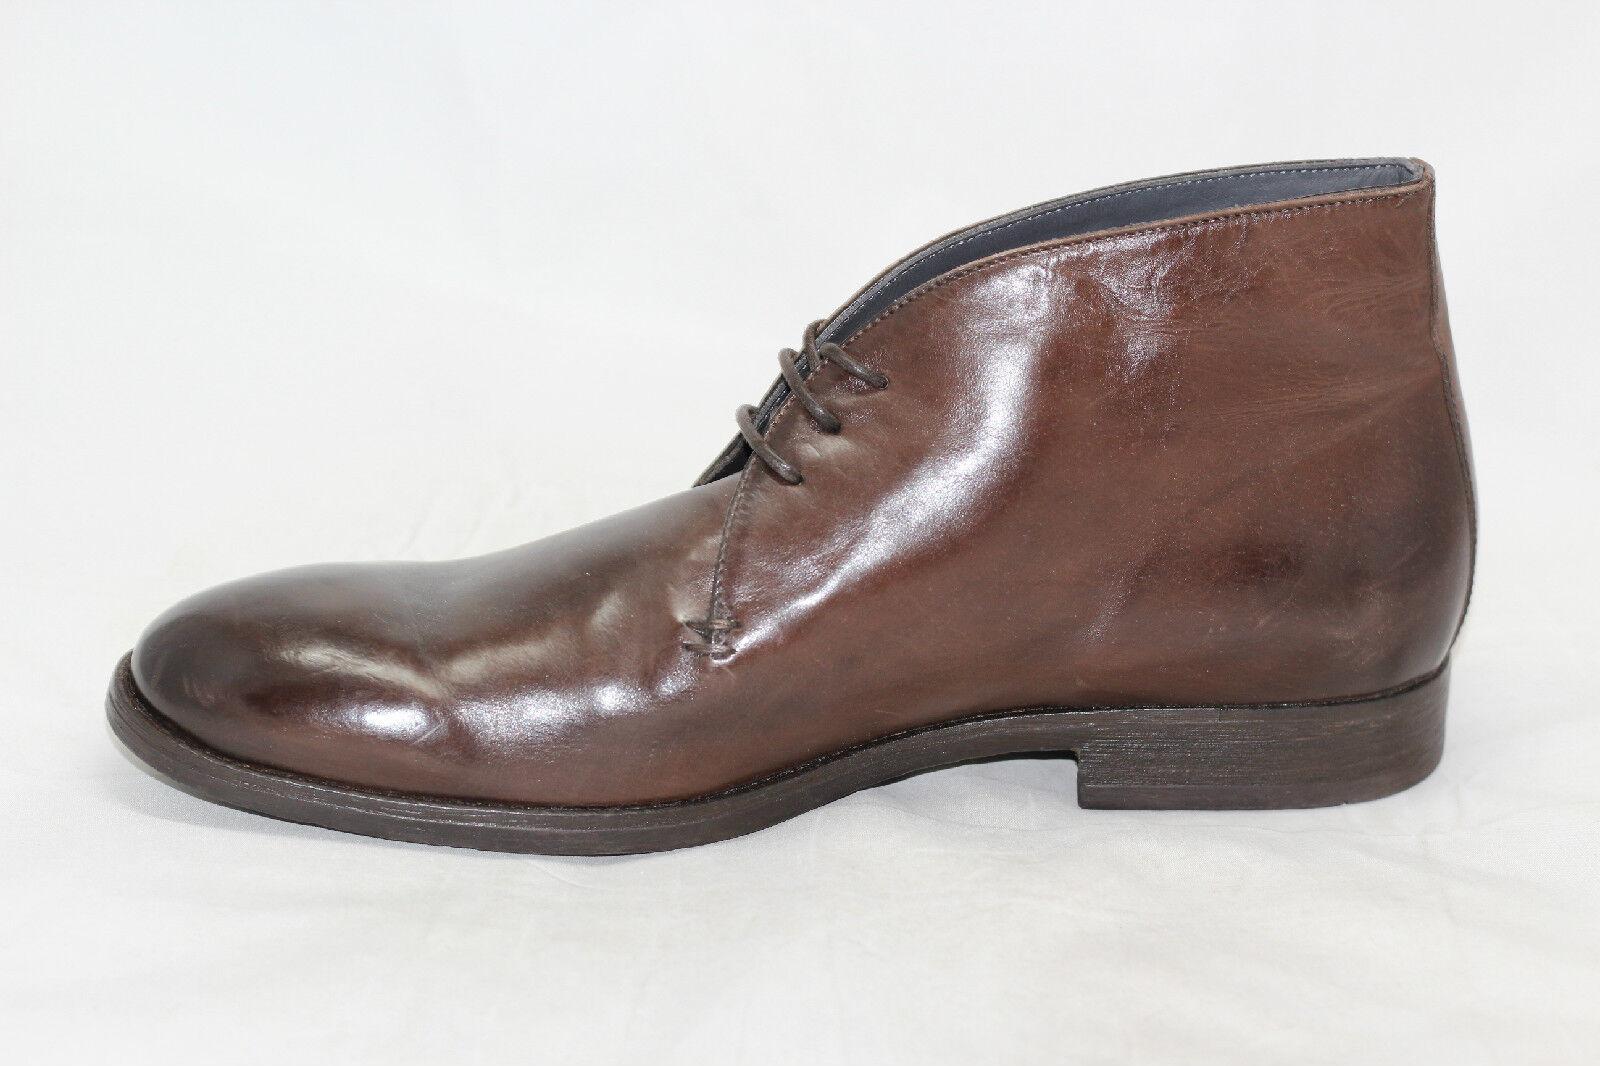 Uomo To Boot New Chukka York 'Cory' Chukka New Boot - Brown - Size 13 - 108208 (W36) 8f43a4